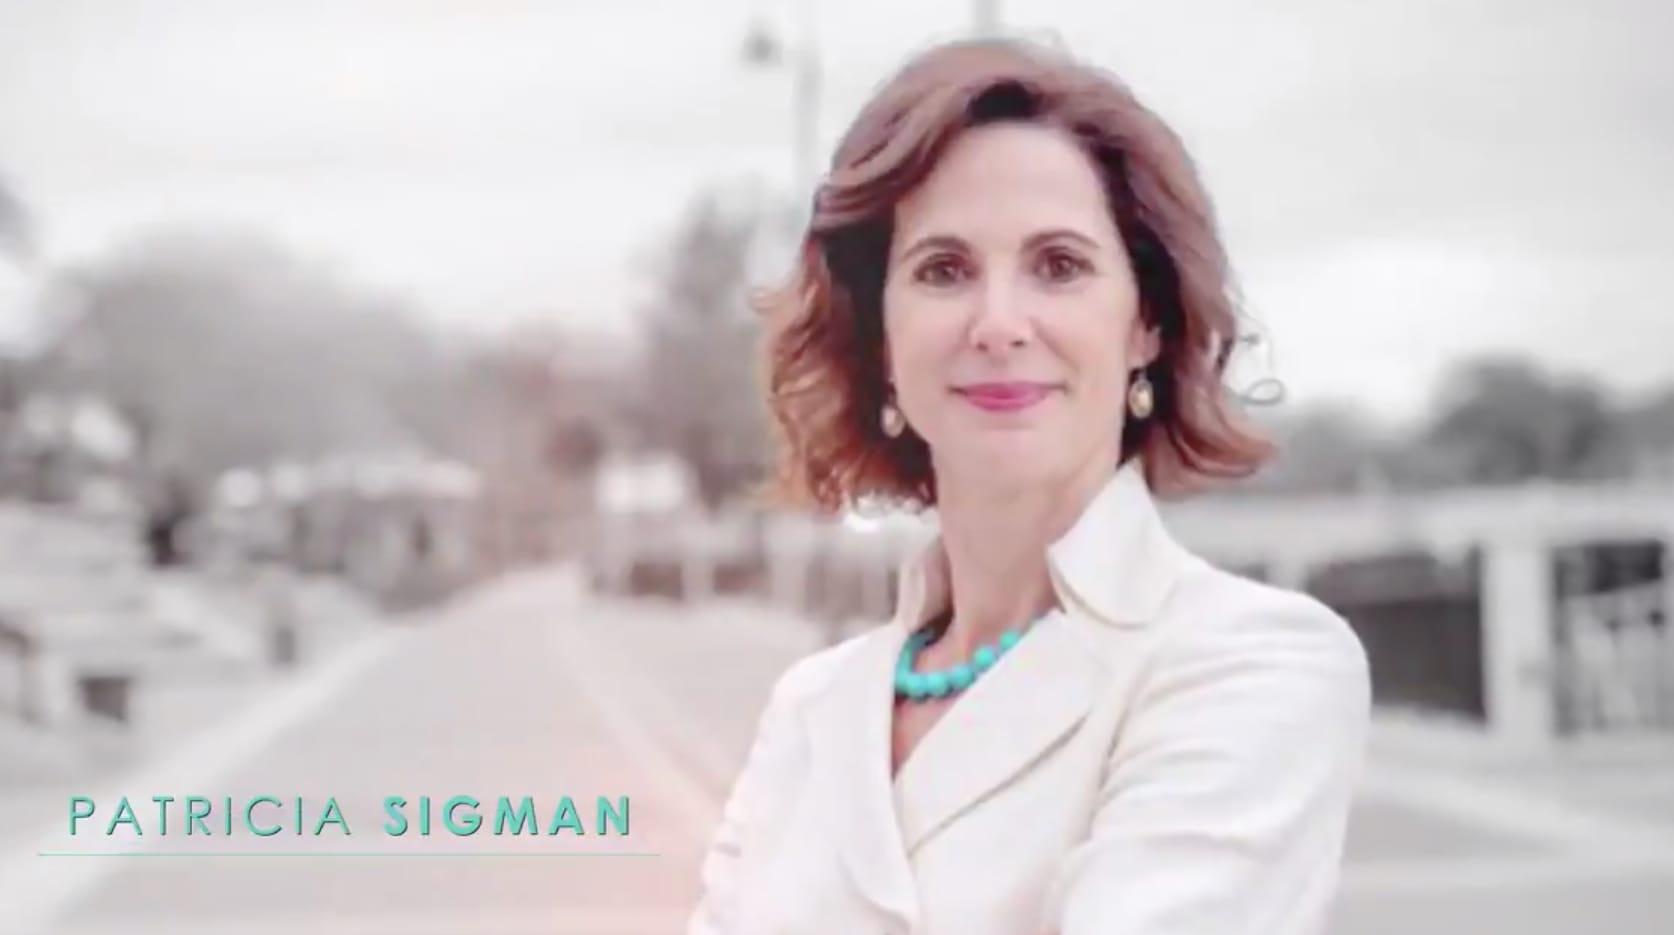 Patricia-Sigman-ad-3.jpg